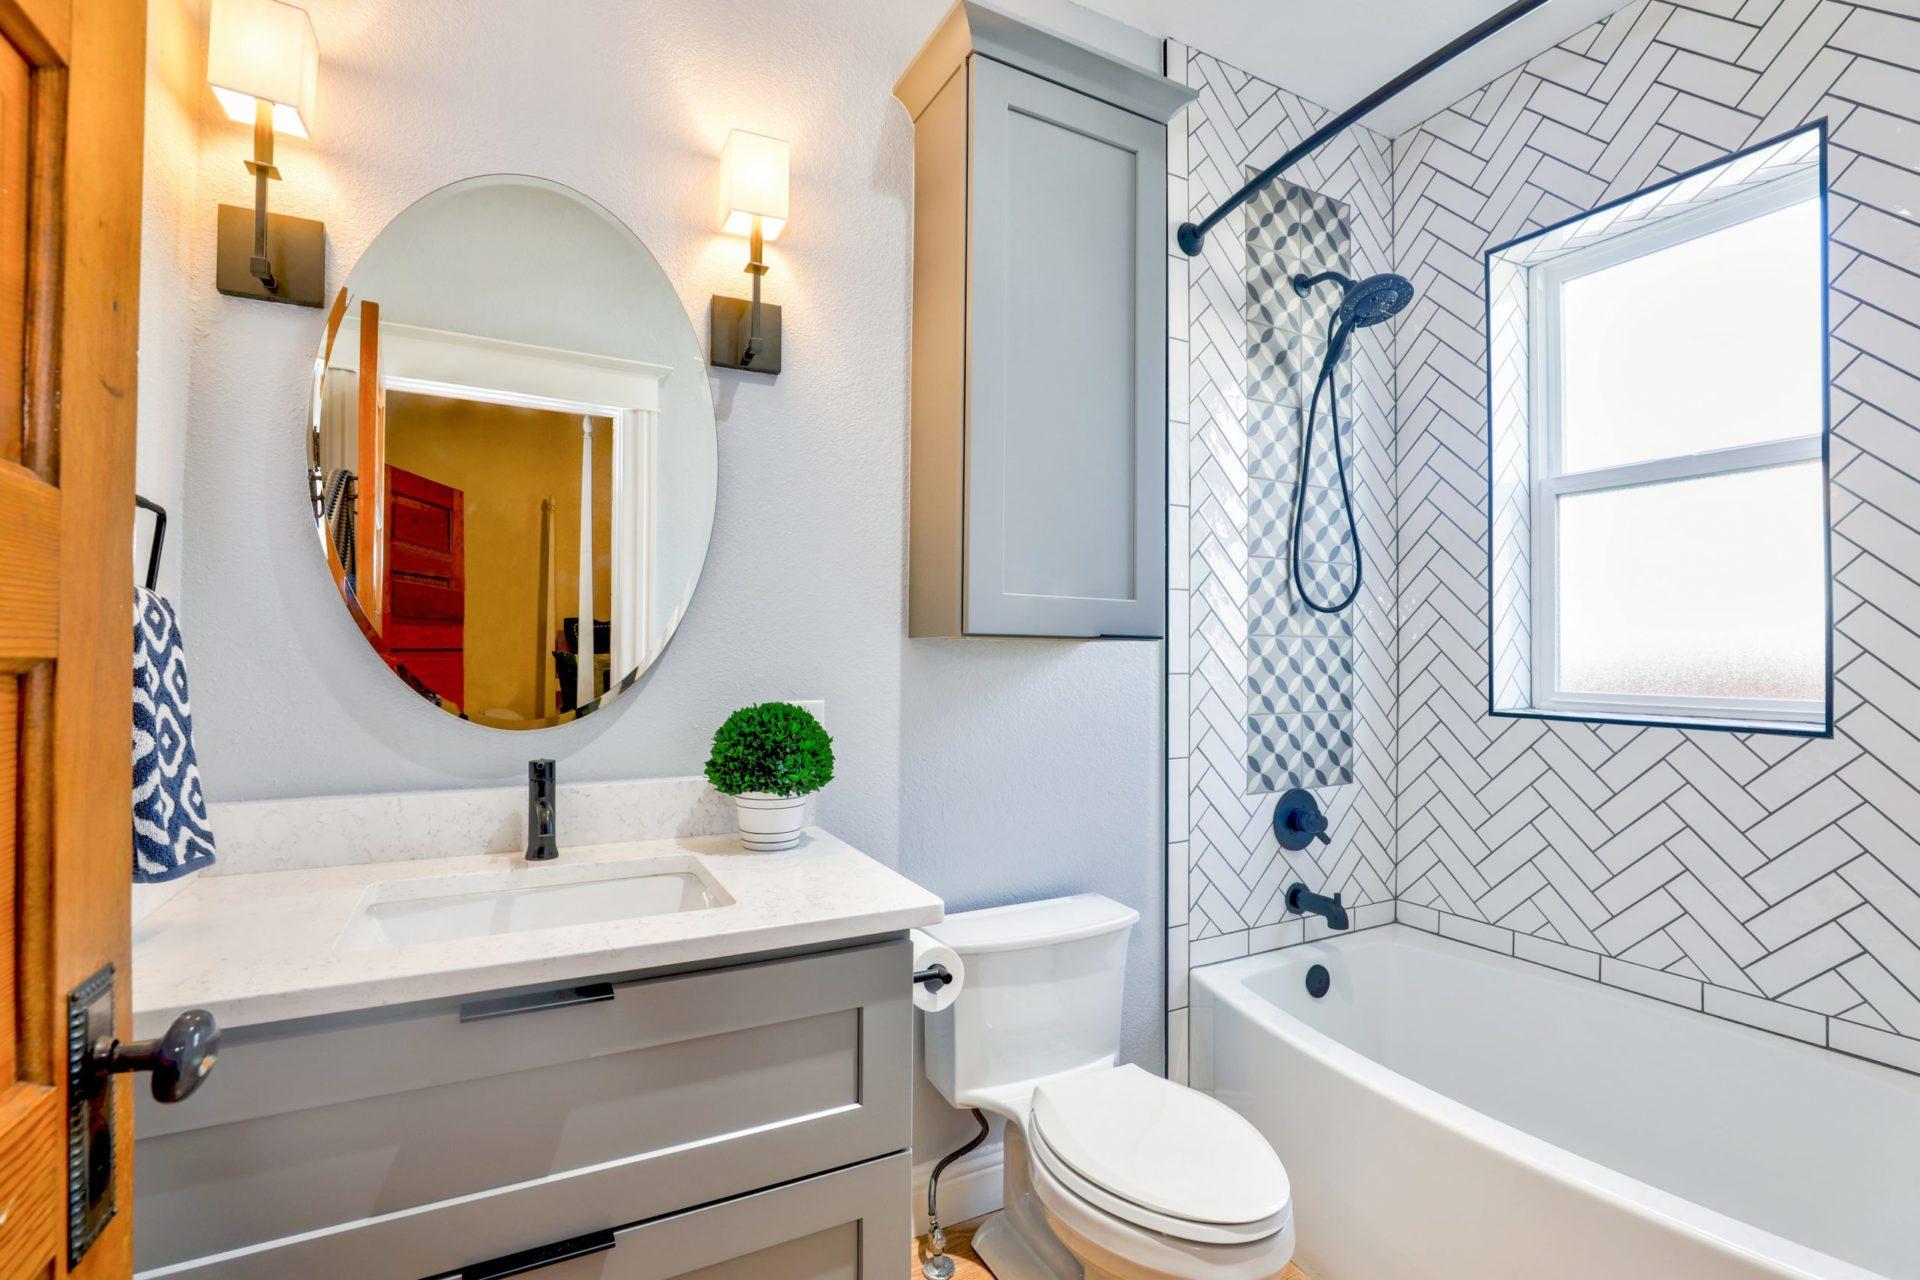 architecture bath bathroom